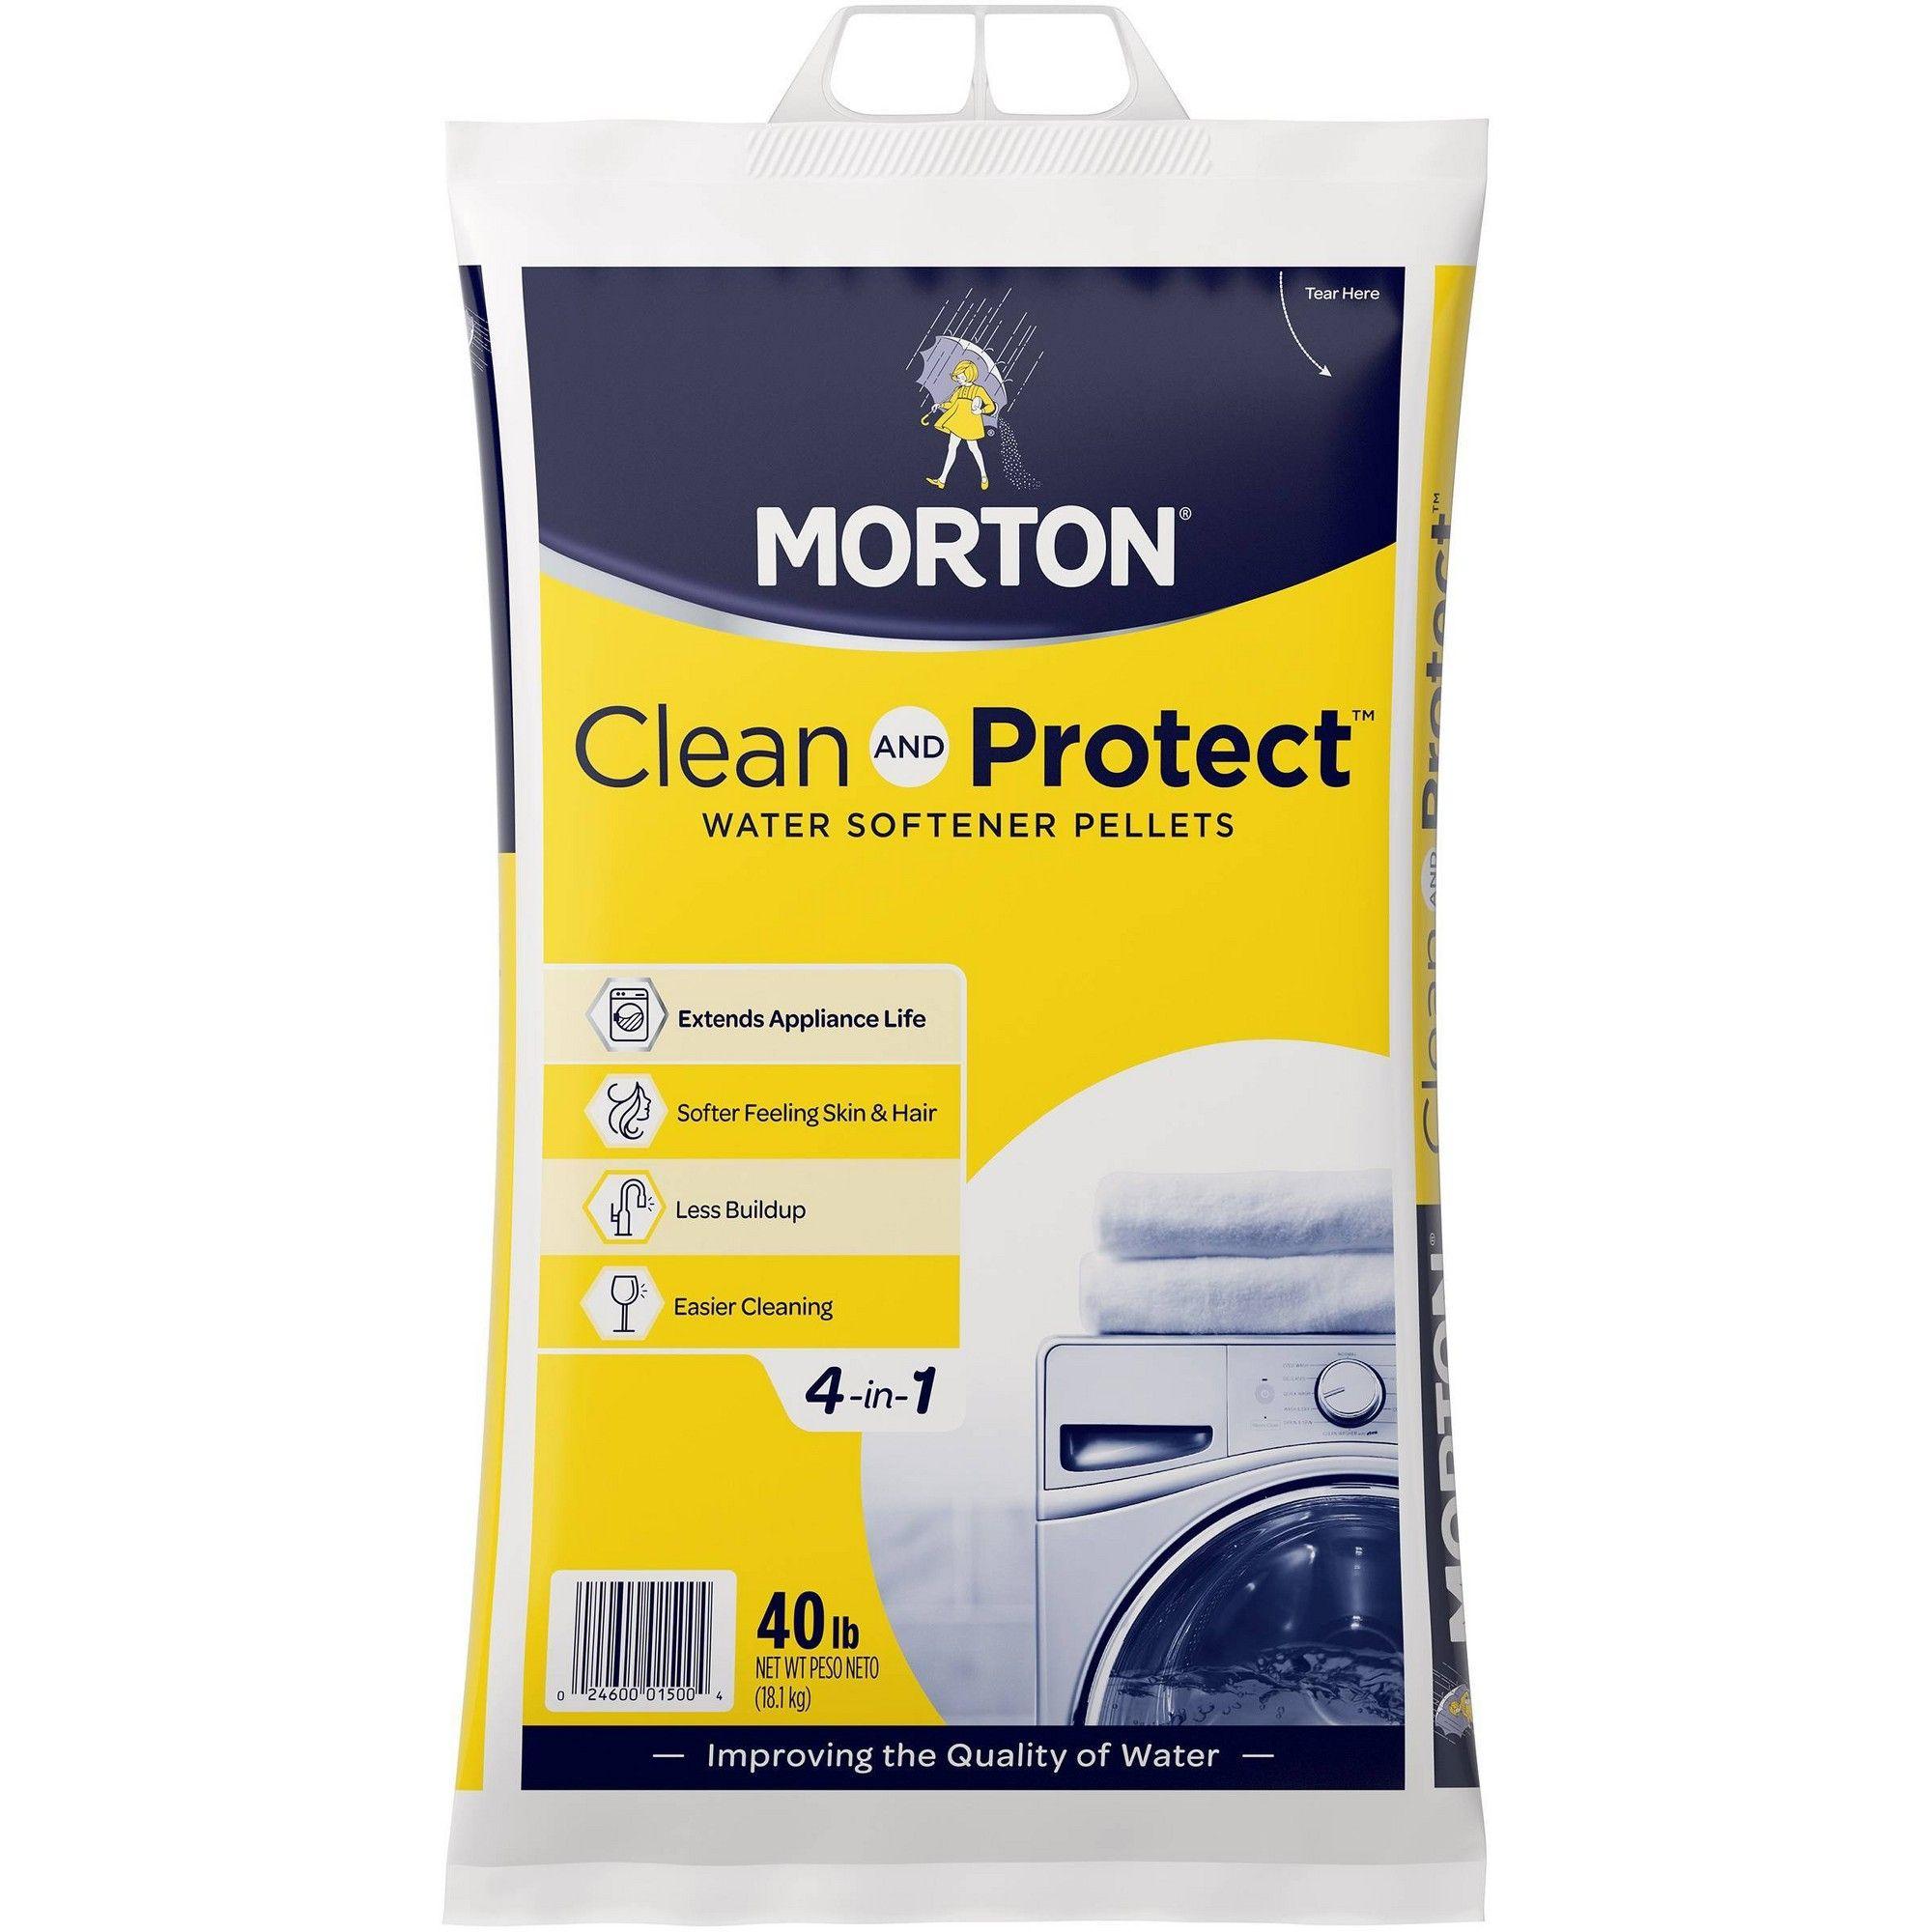 Morton Water Softener Pellets 40lbs In 2019 Cleaning Morton Salt